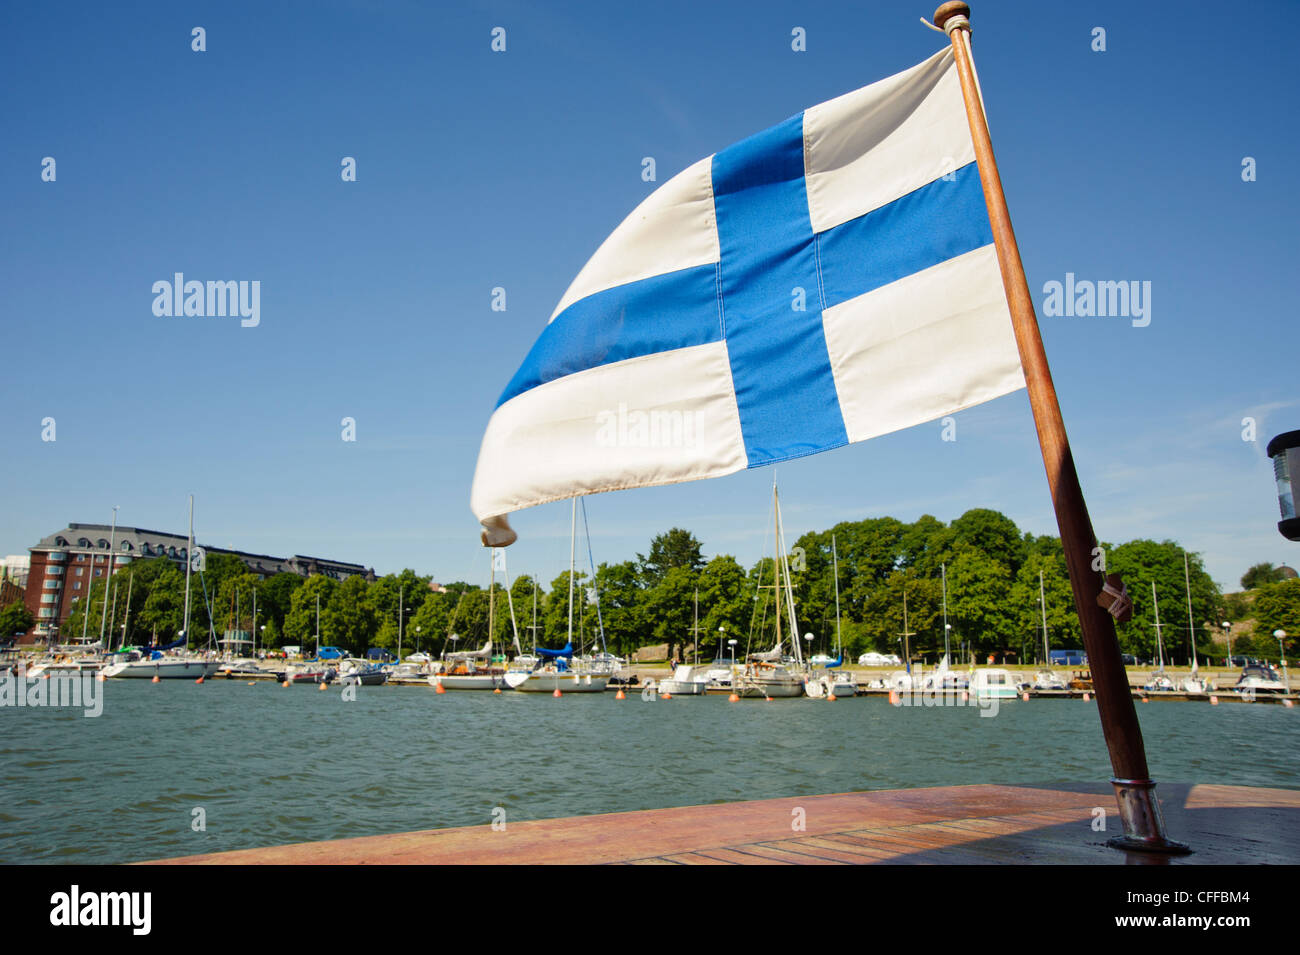 The Finnish flag flies from a boat shuttling between Unisaari island and the Merisatama quayside, Helsinki Finland Stock Photo